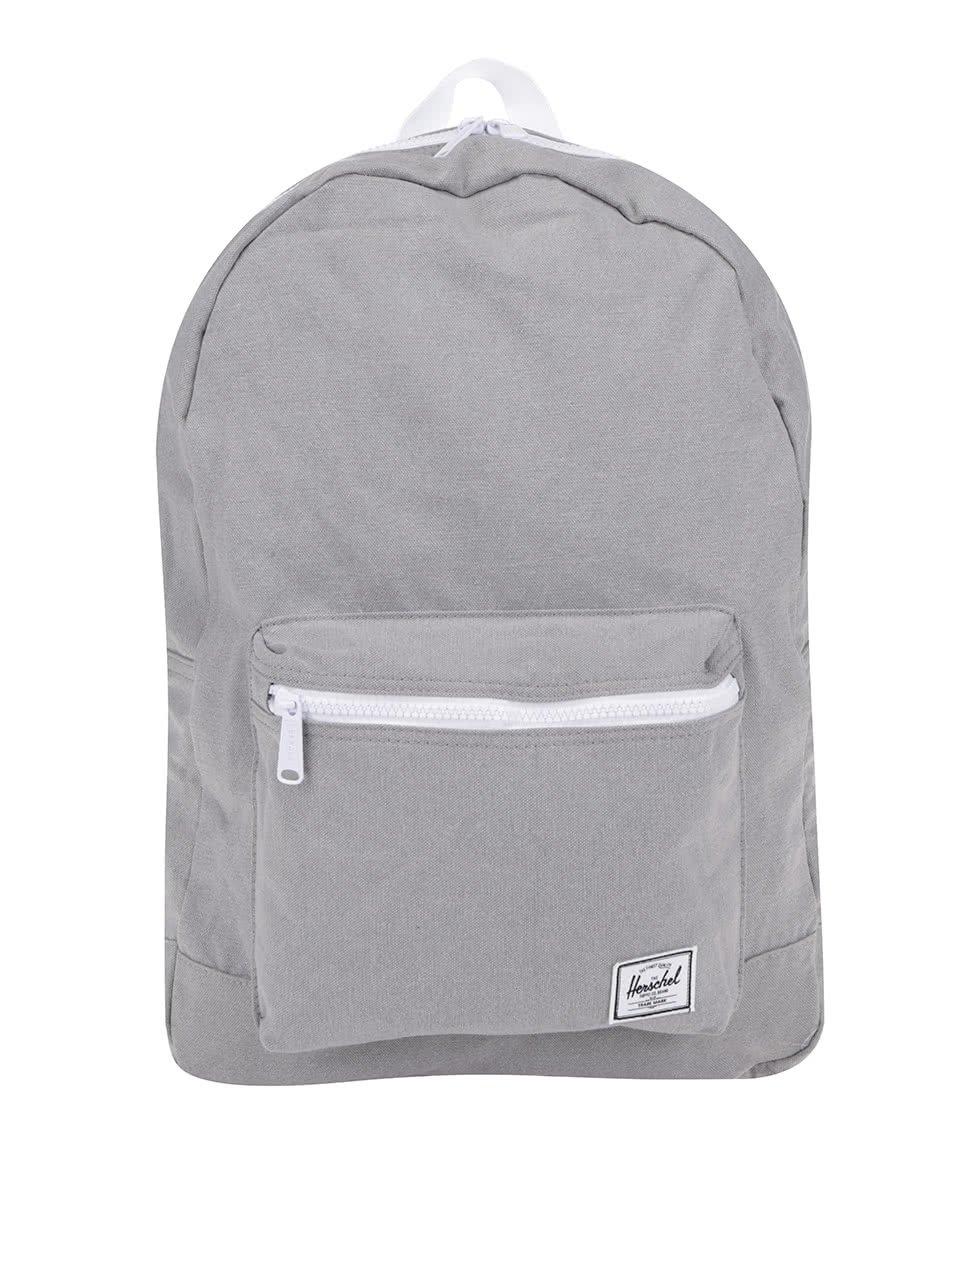 Šedý batoh Herschel Packable 24,5 l